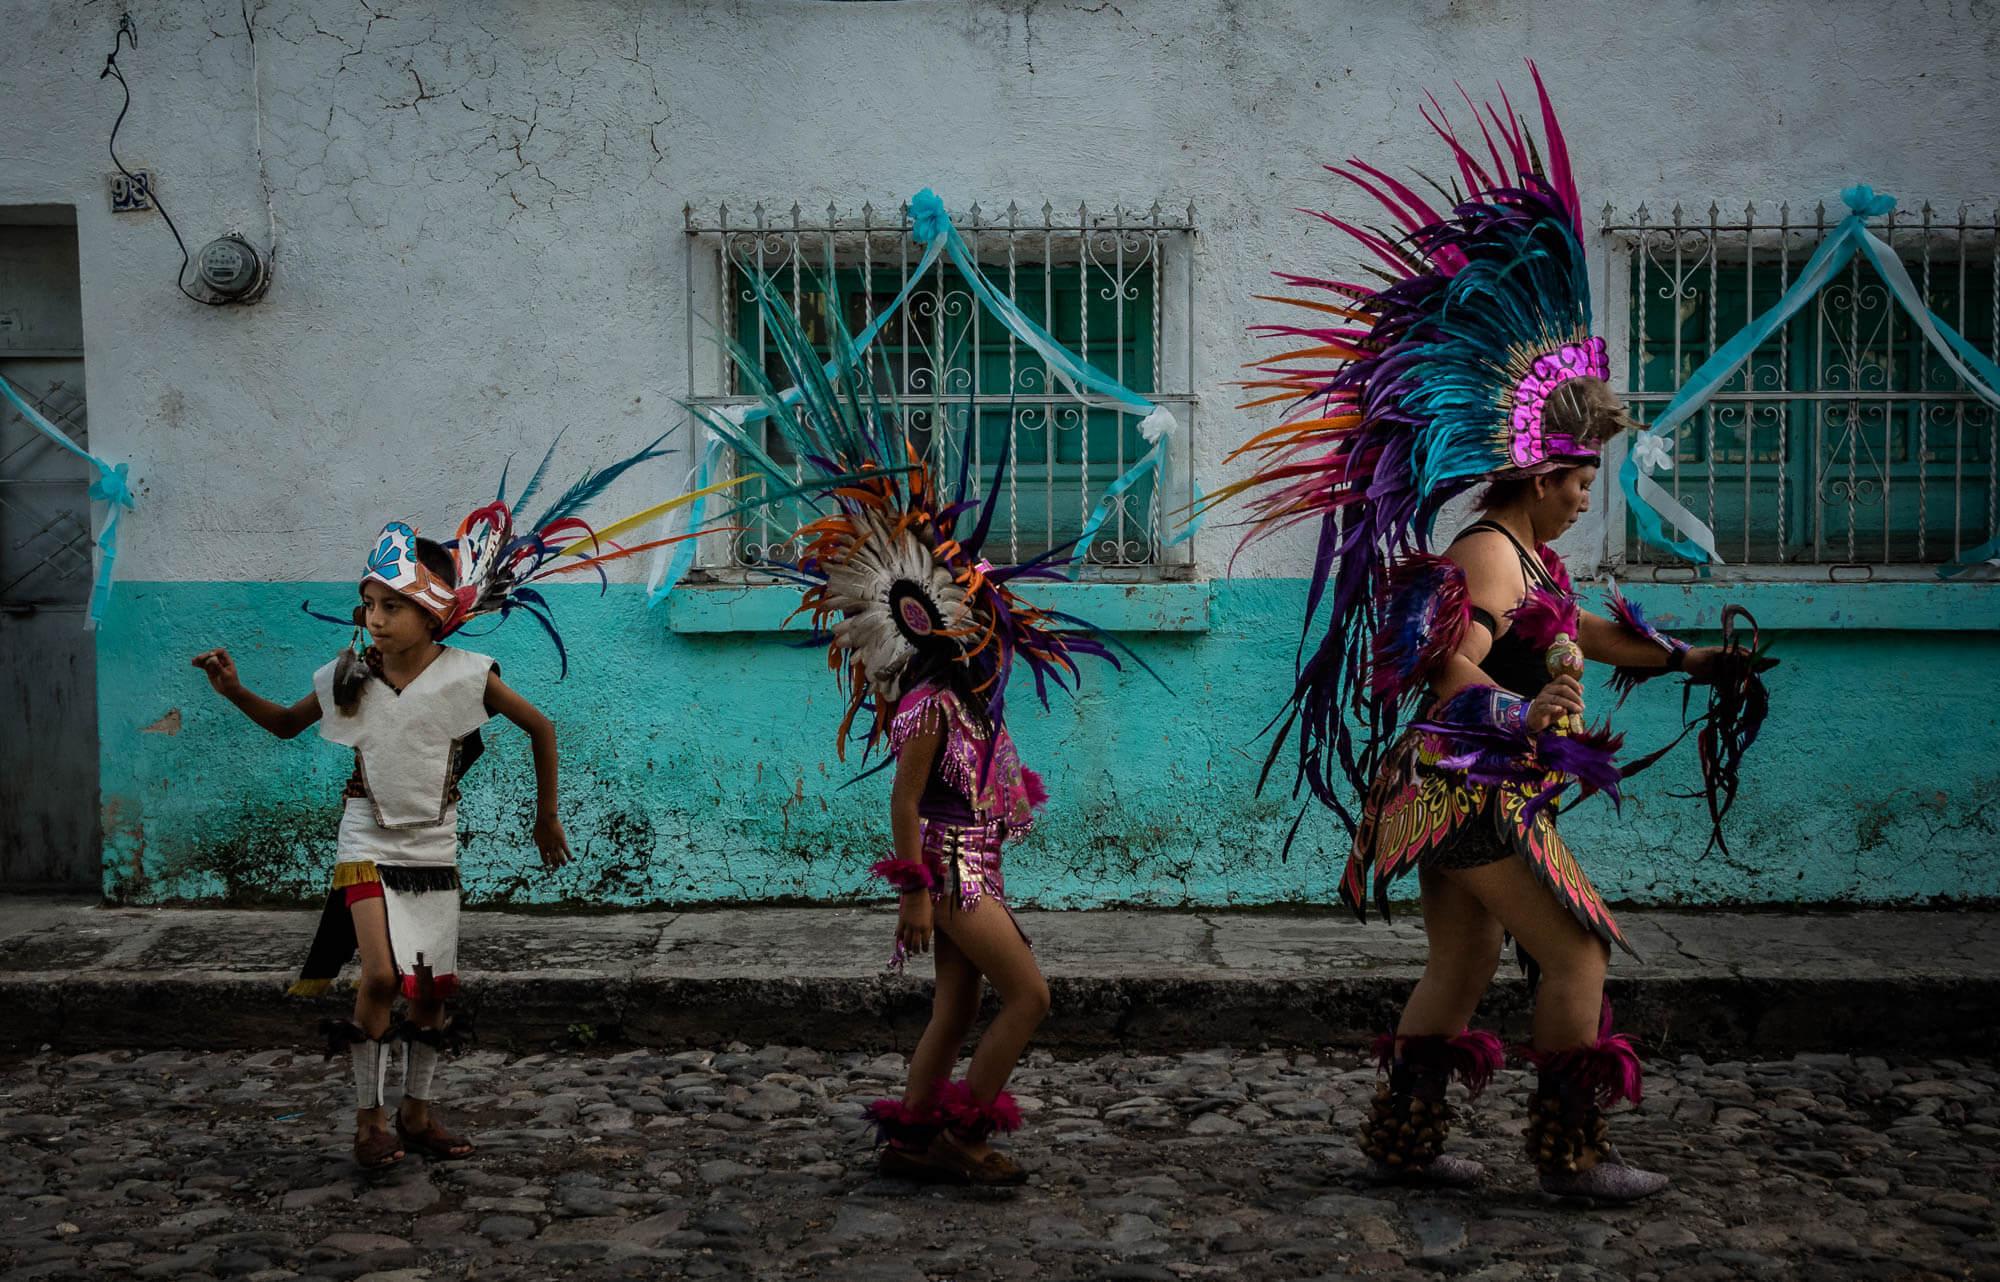 The Aztec Dancers